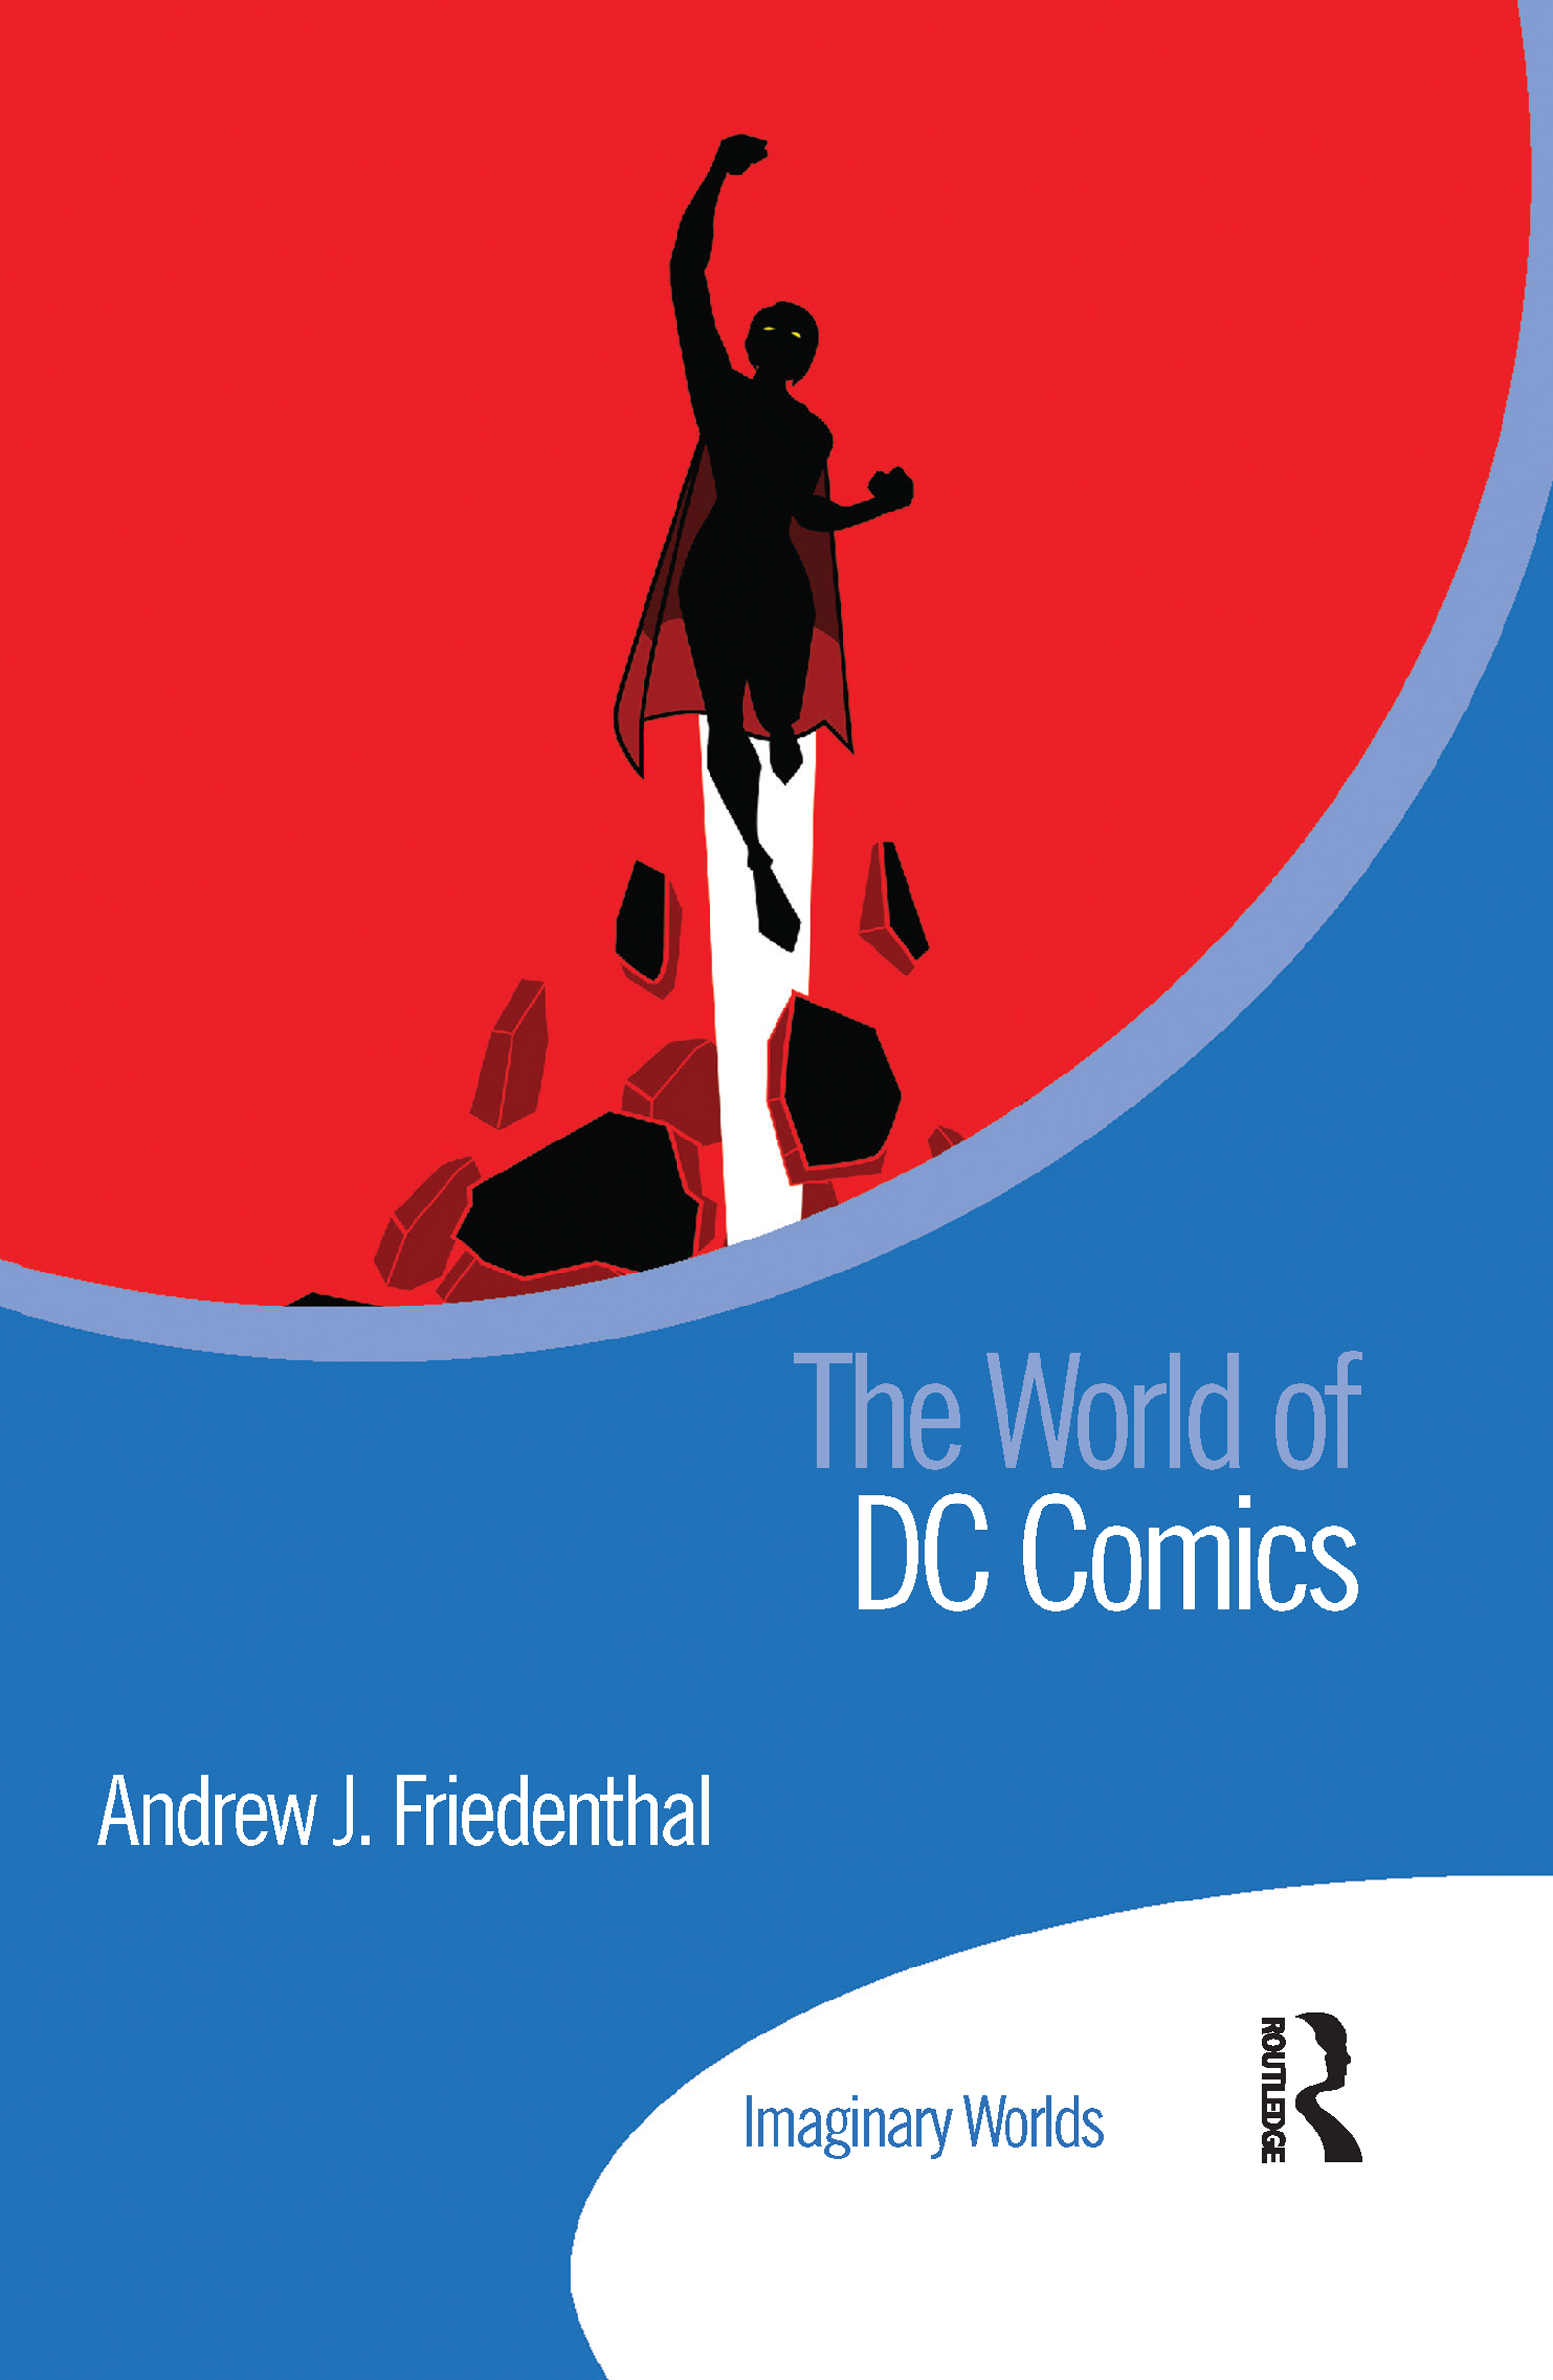 The World of DC Comics